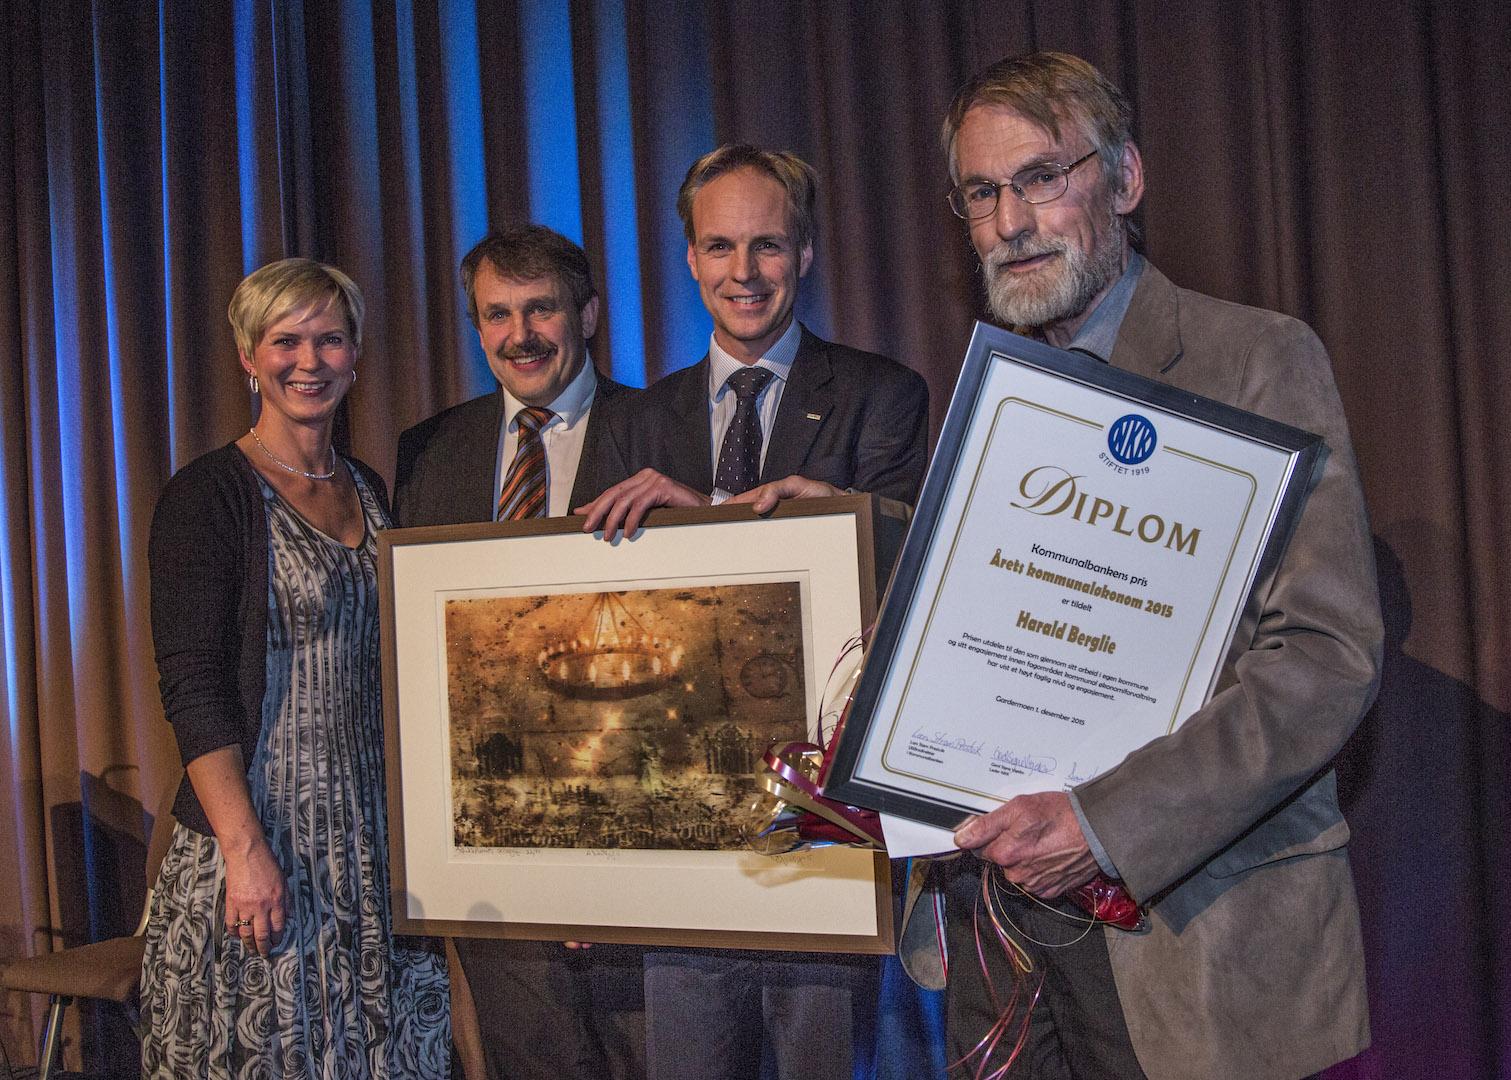 Kommunalbankens pris – Årets Kommunaløkonom 2015